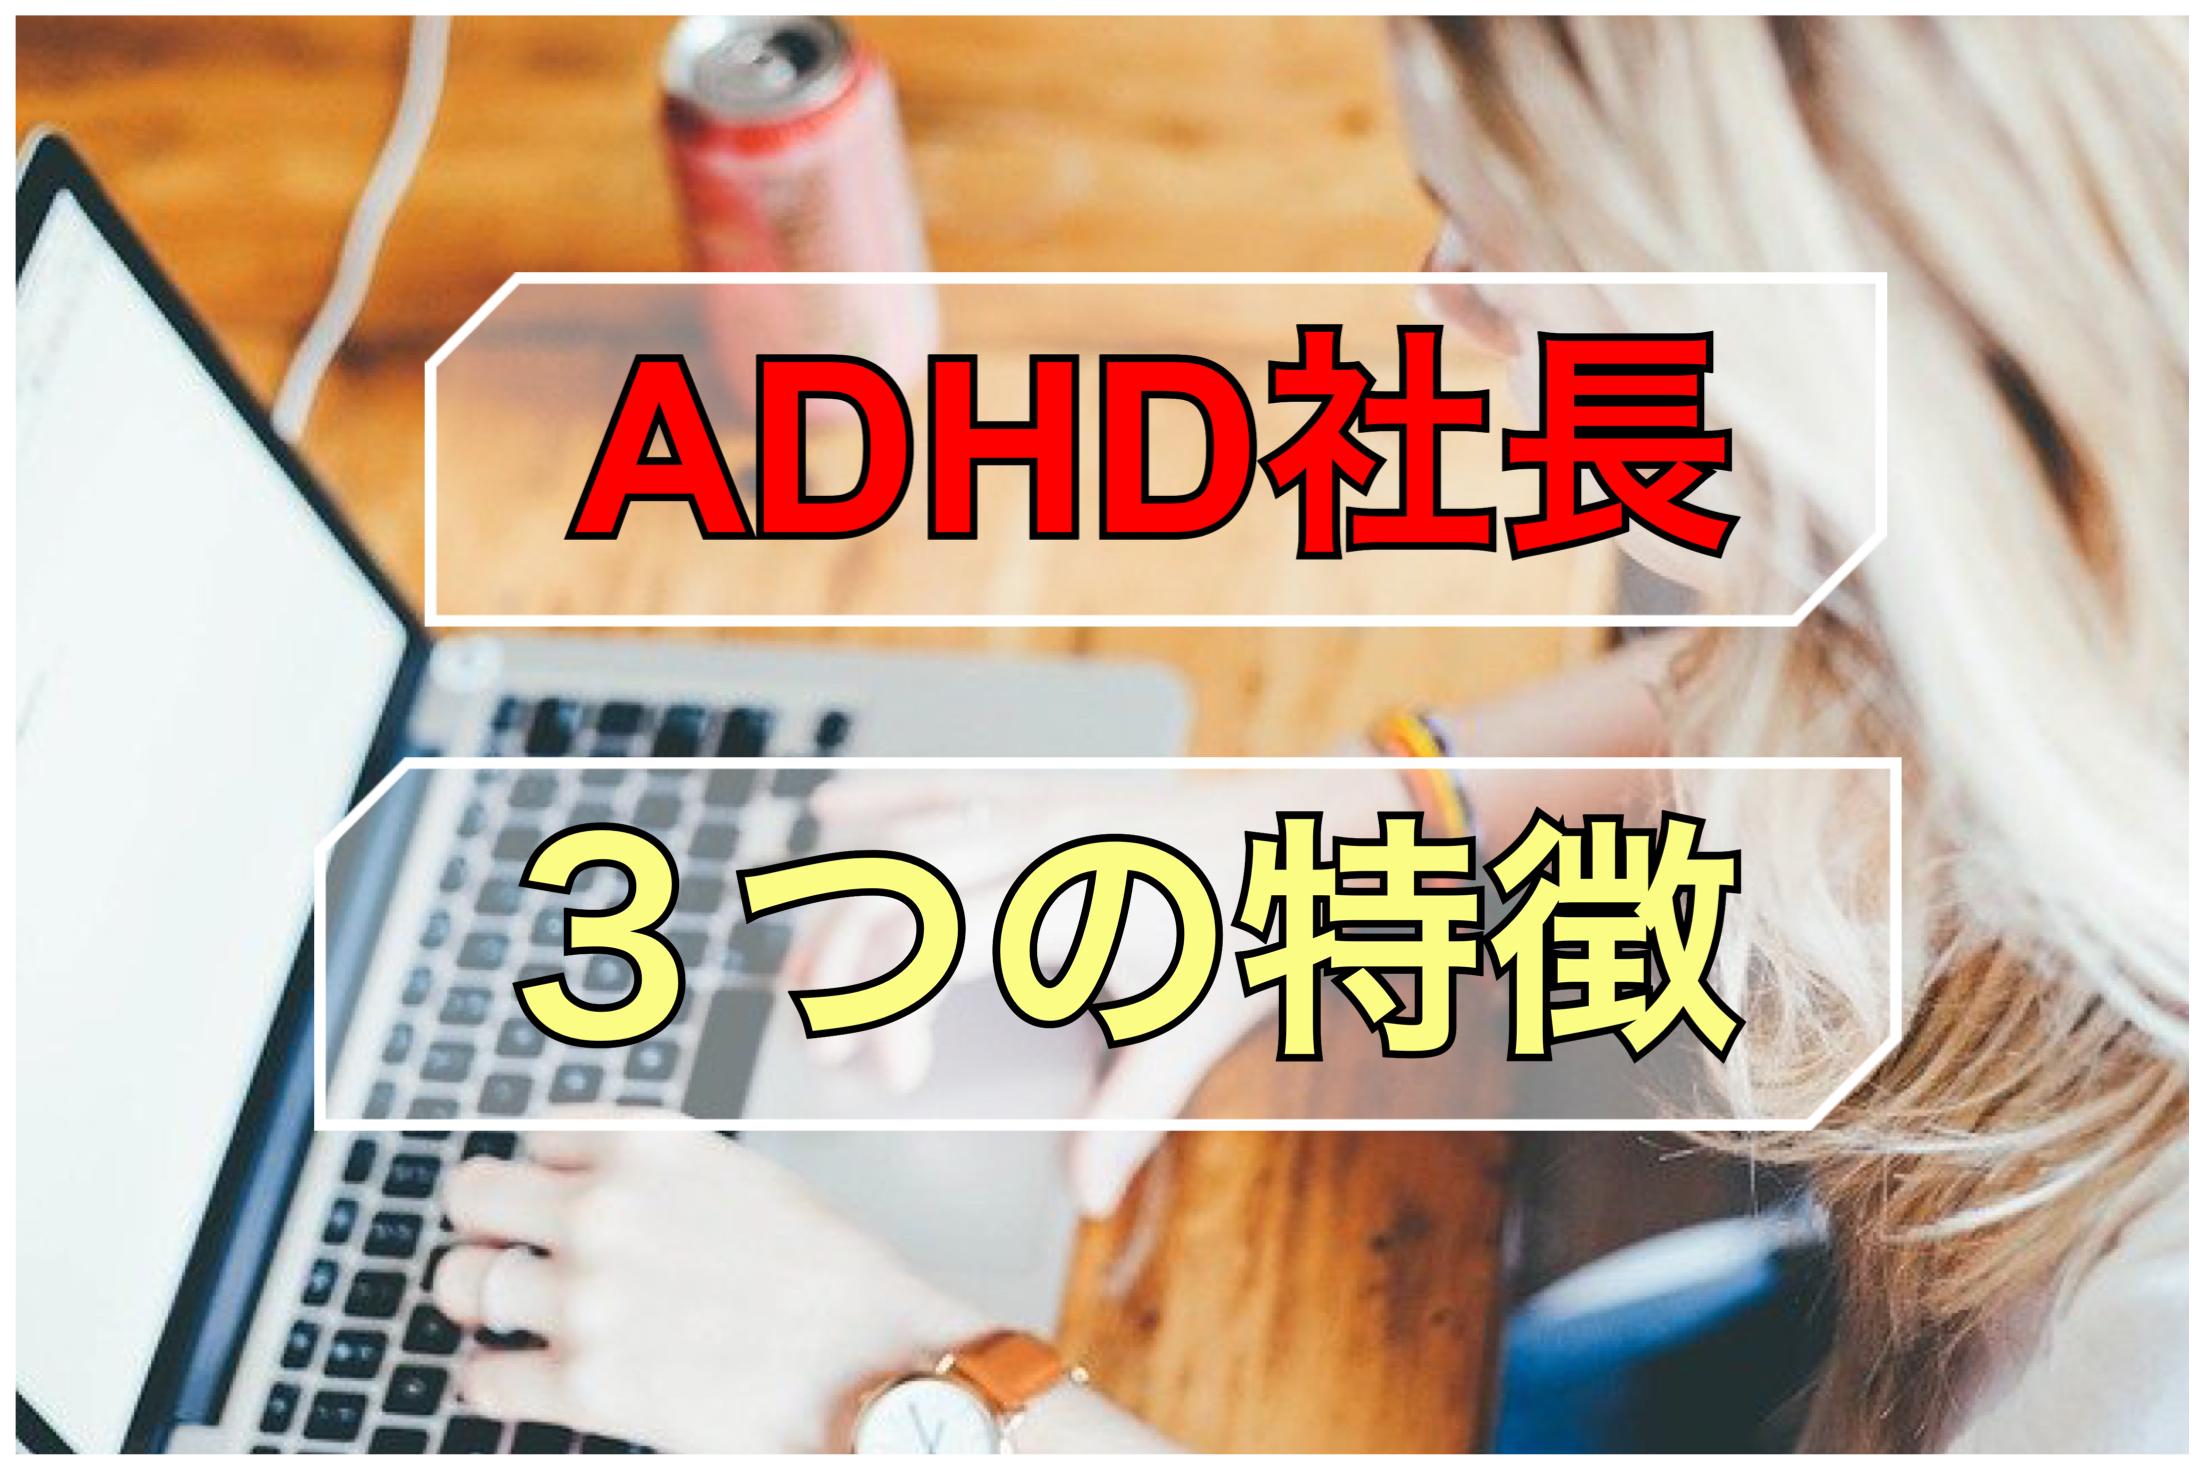 ADHD,社長,特徴